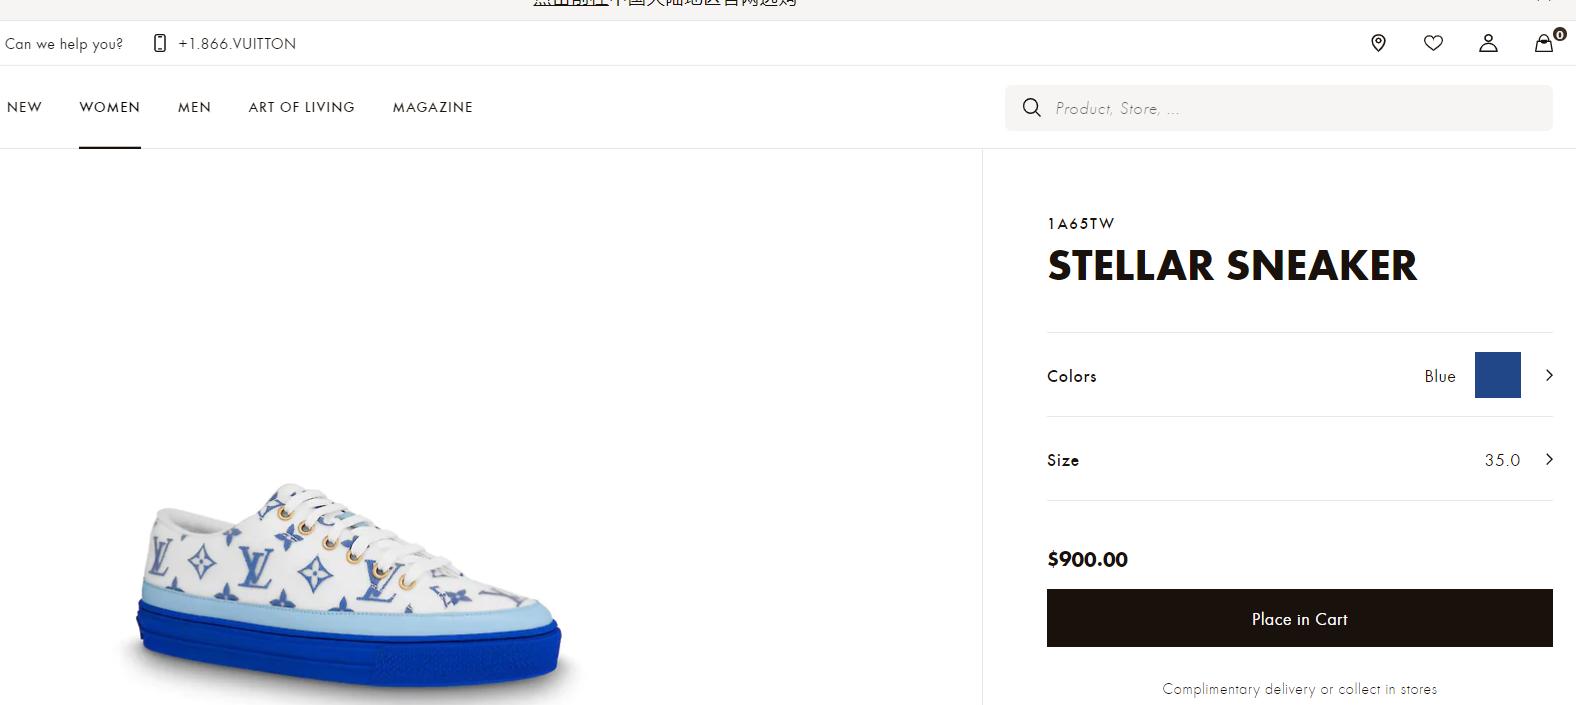 stellar sneaker blue    sneaker    women shoes  1A65TW Monogram print   1